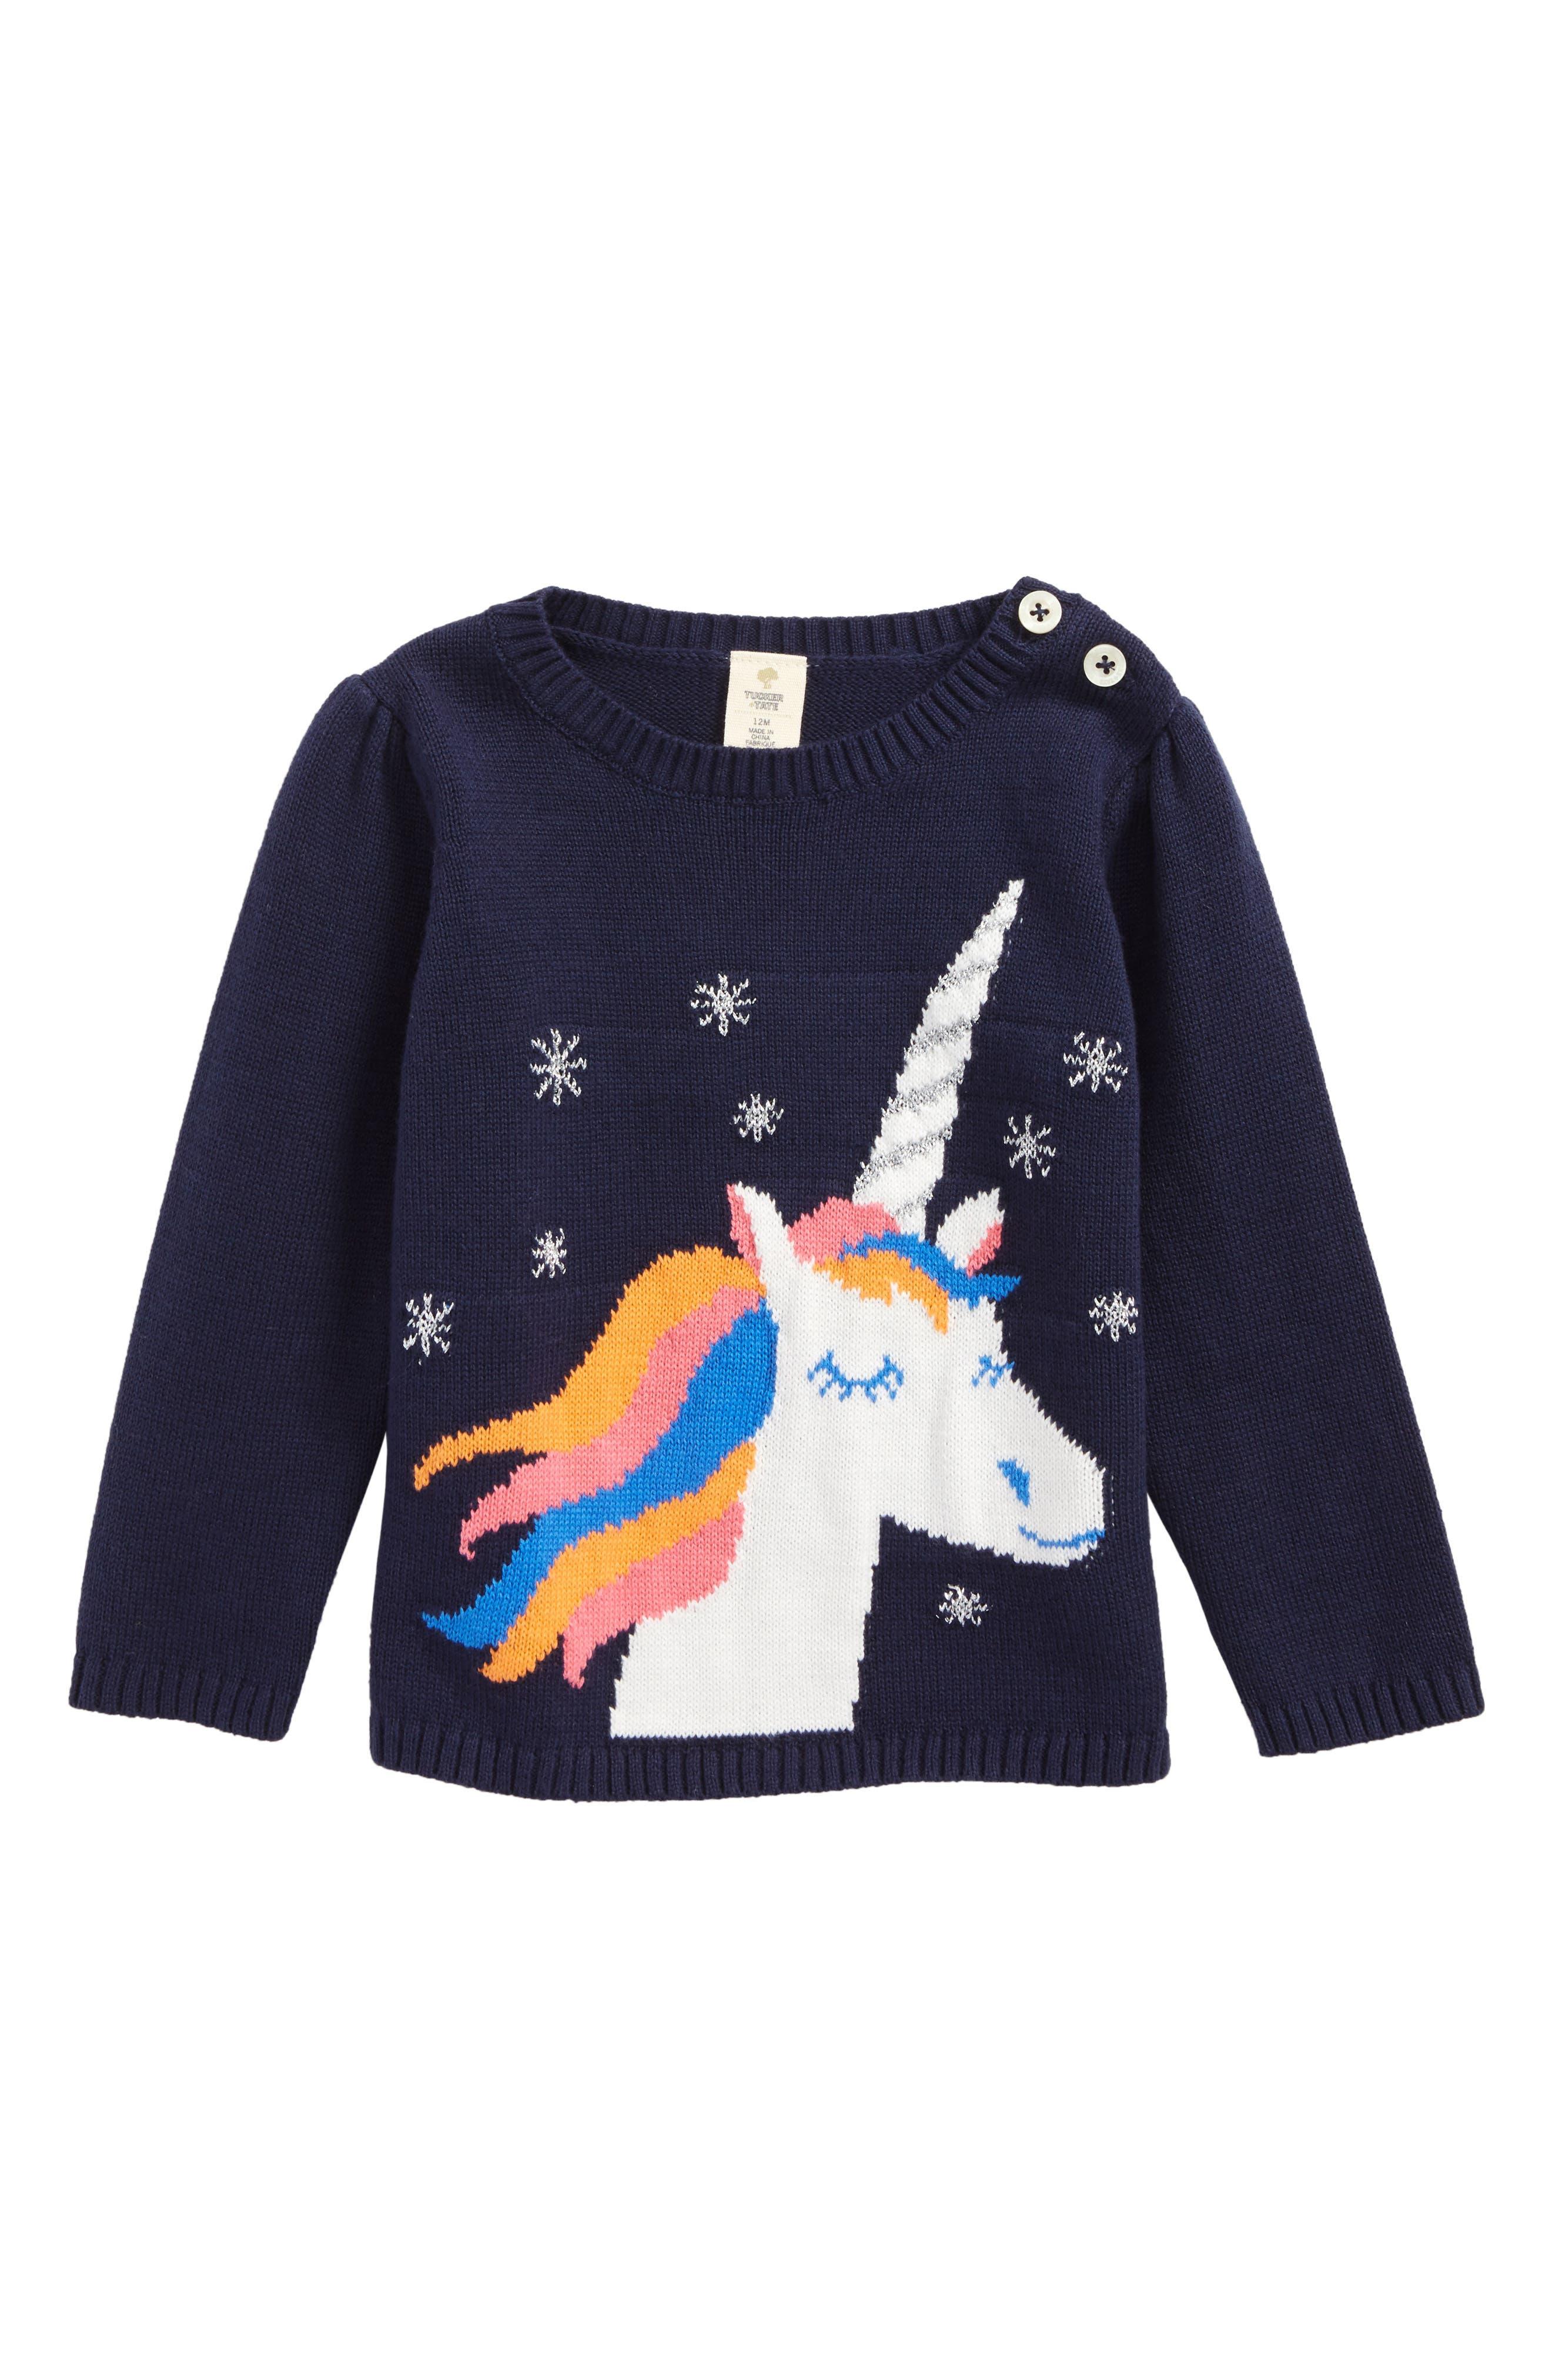 Alternate Image 1 Selected - Tucker + Tate Unicorn Sweater (Baby Girls)